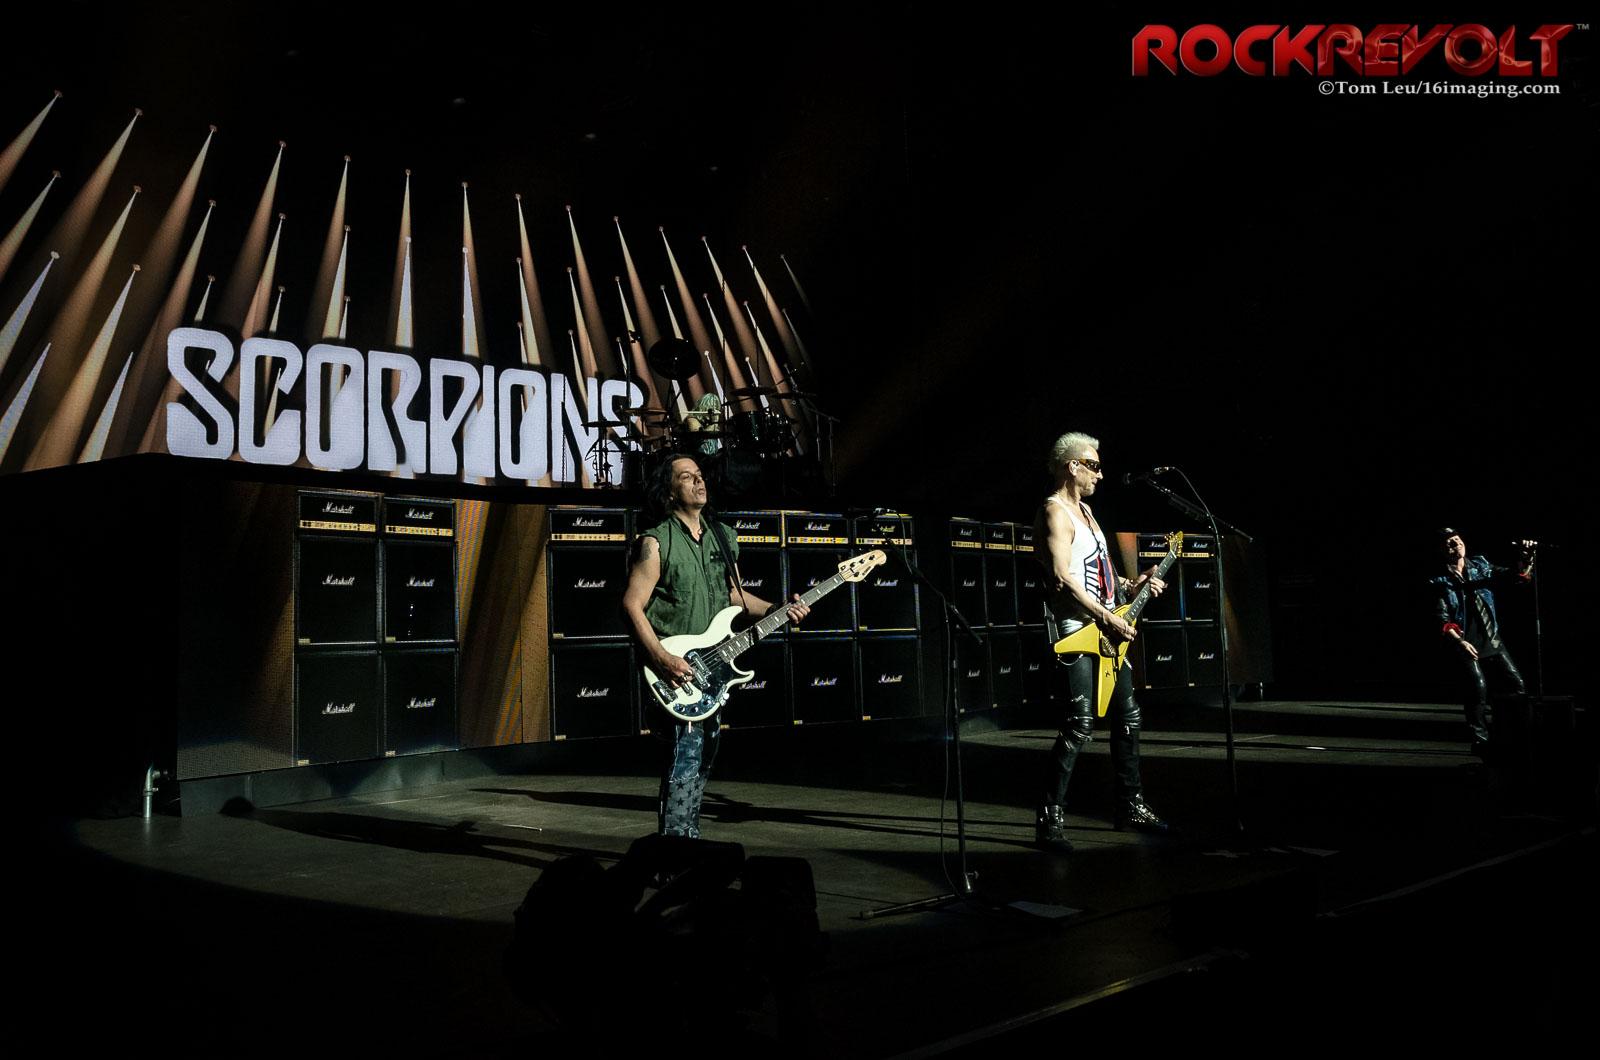 2016_Scorpions_RockRevolt15